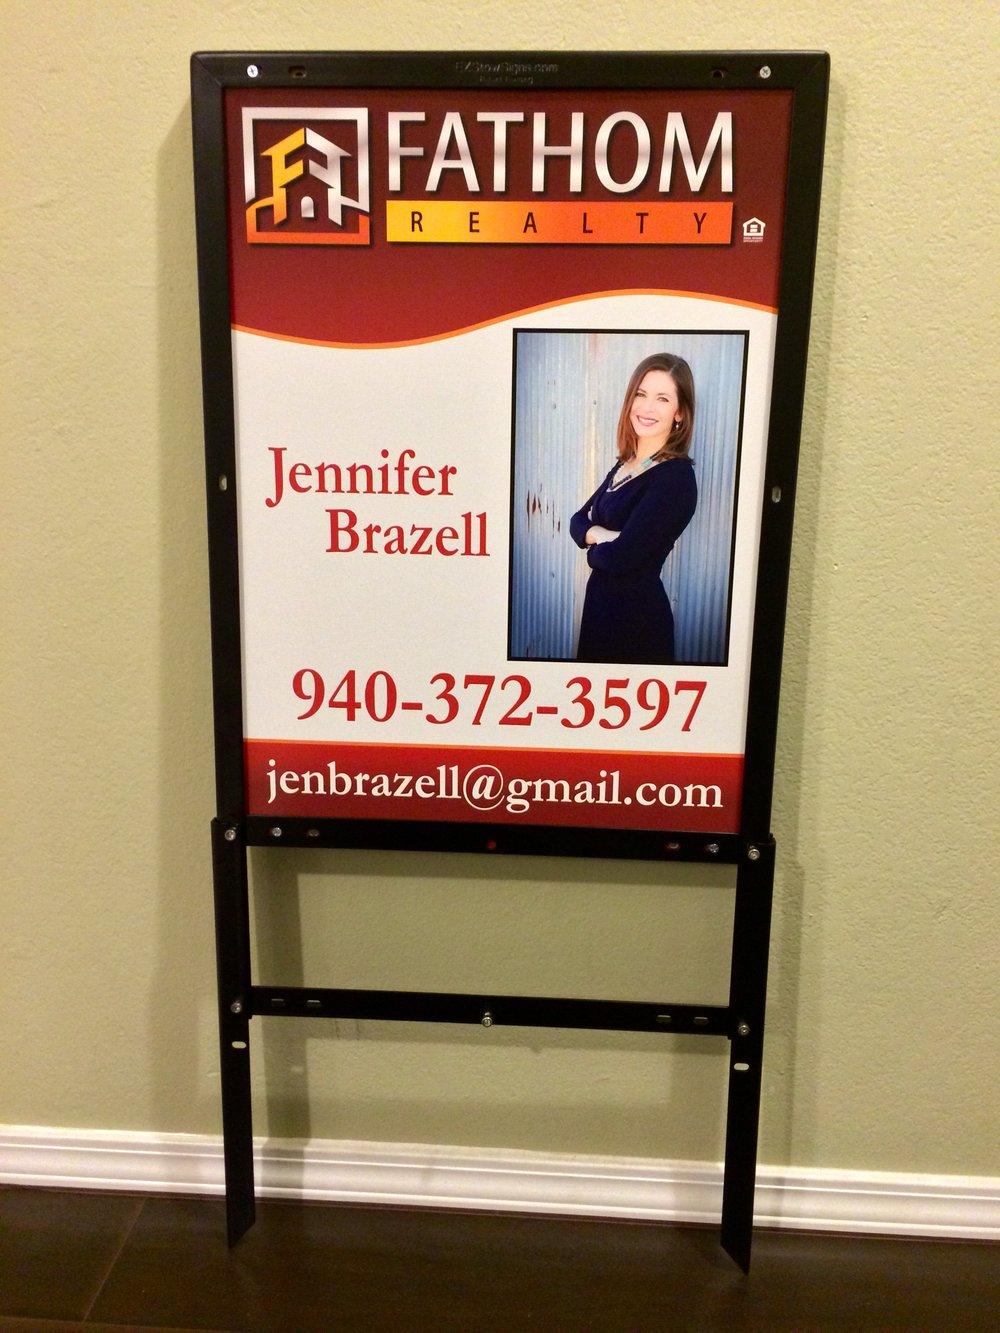 Fathom Jennifer Brazell V Combo.jpg